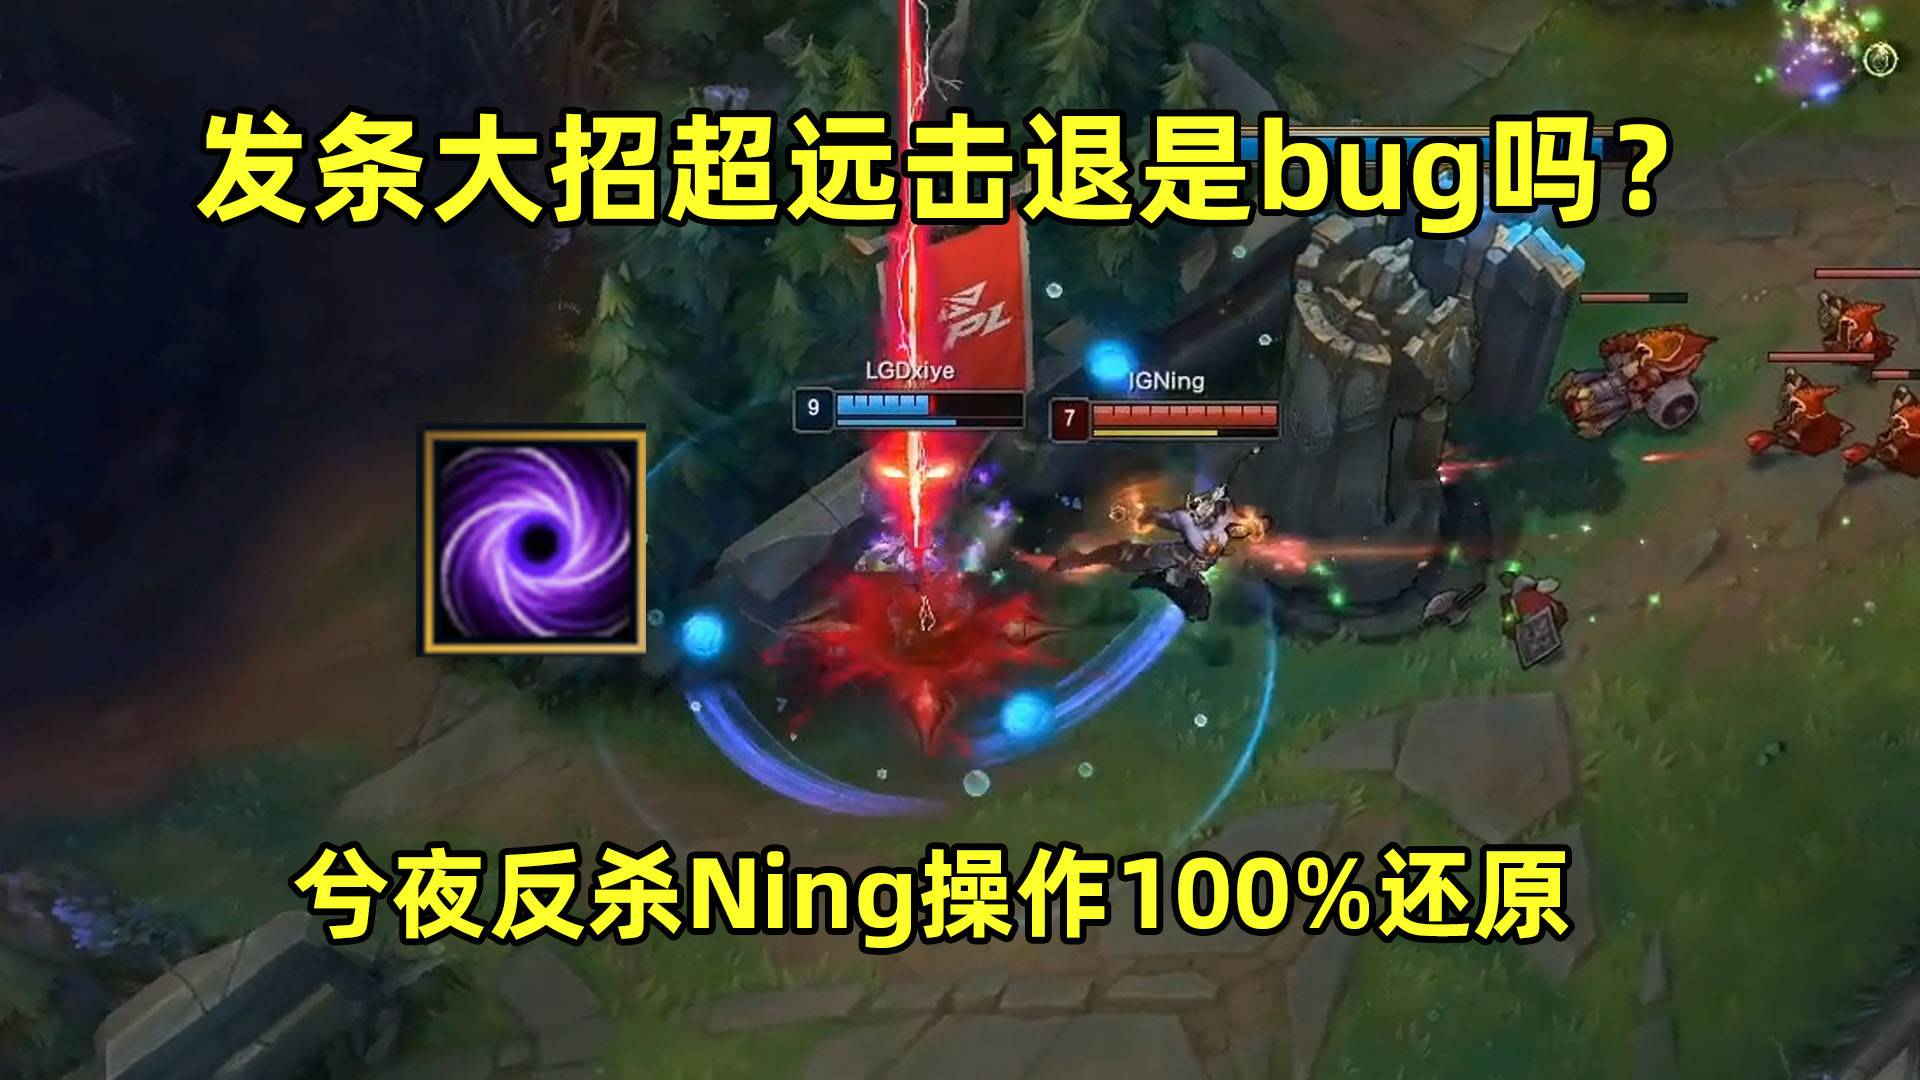 LGDvsIG中兮夜发条用大招反杀Ning是否存在bug?看完视频答案已在心中!